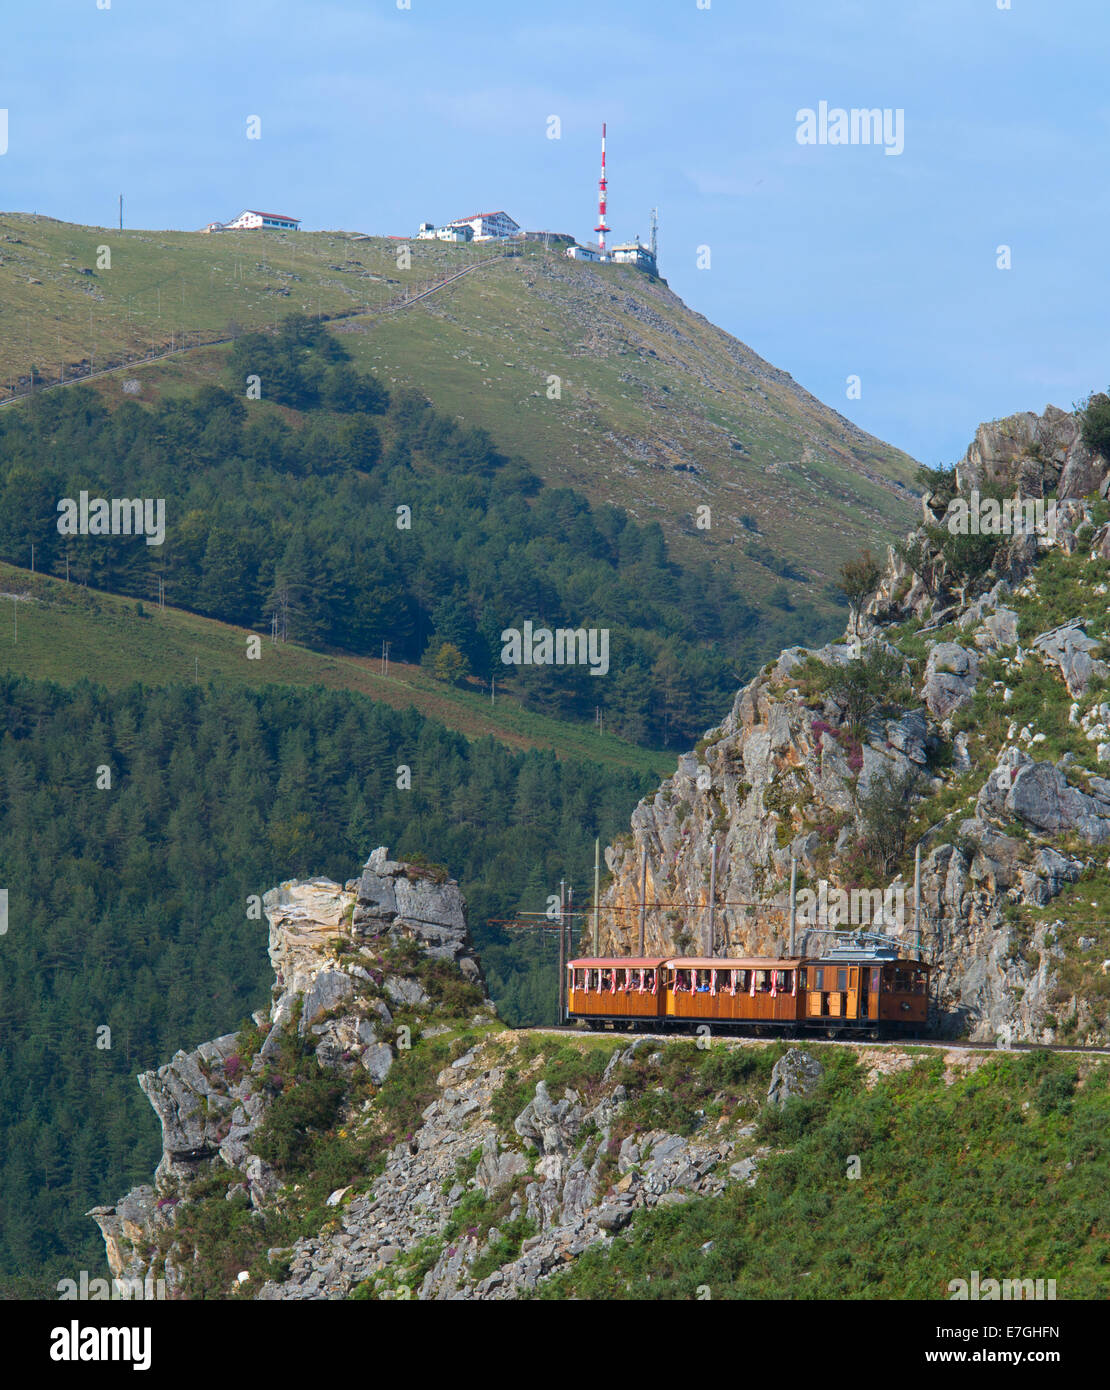 Road train the Mount Larrun, Euskadi, France - Stock Image